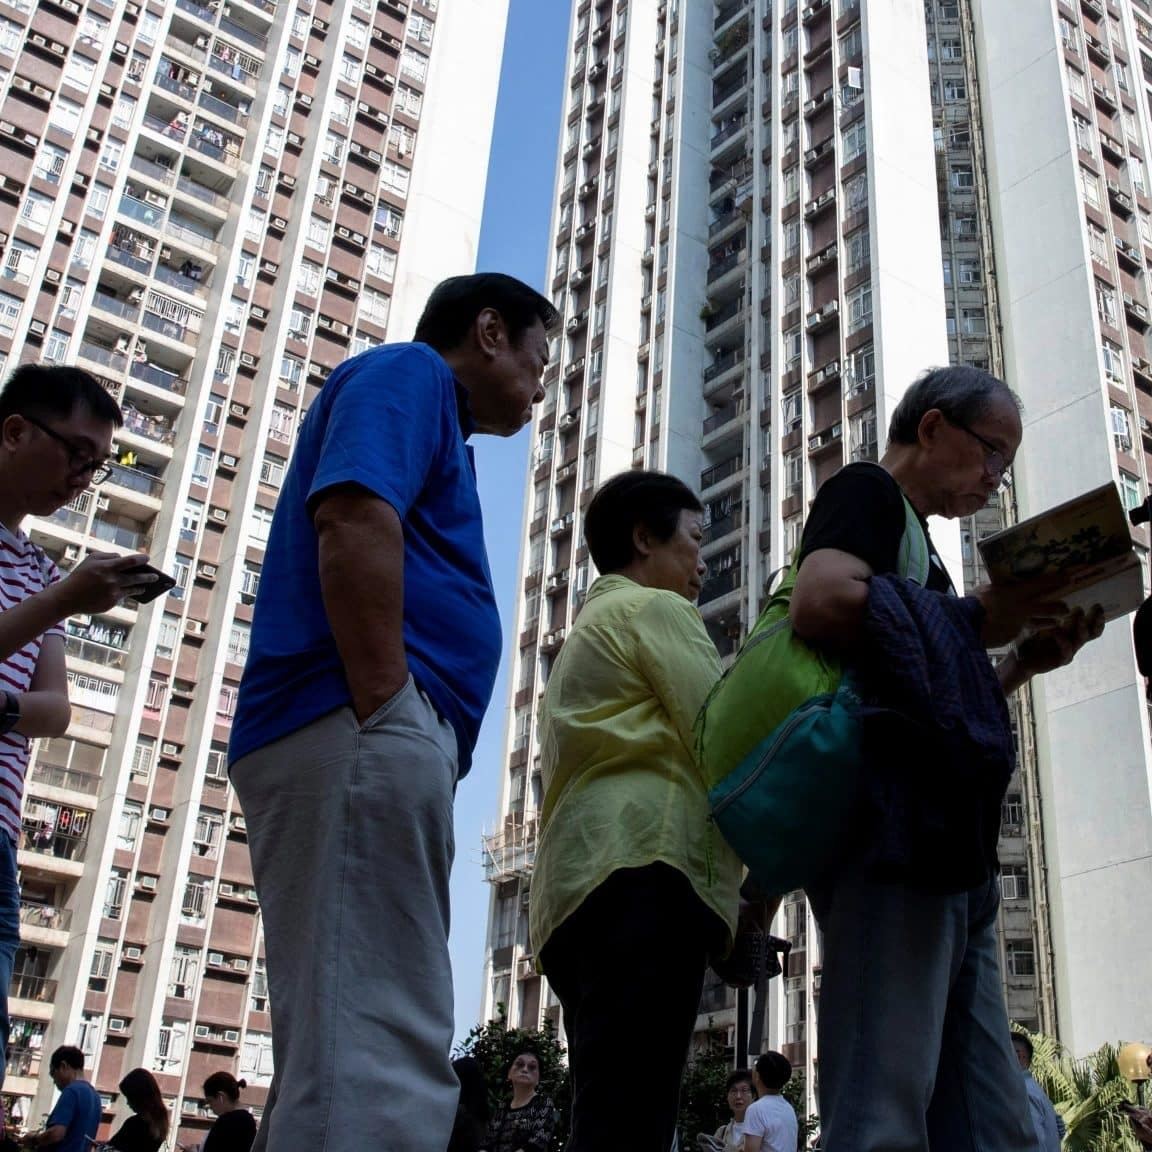 Elezioni ad Hong Konng e democrazia cinese